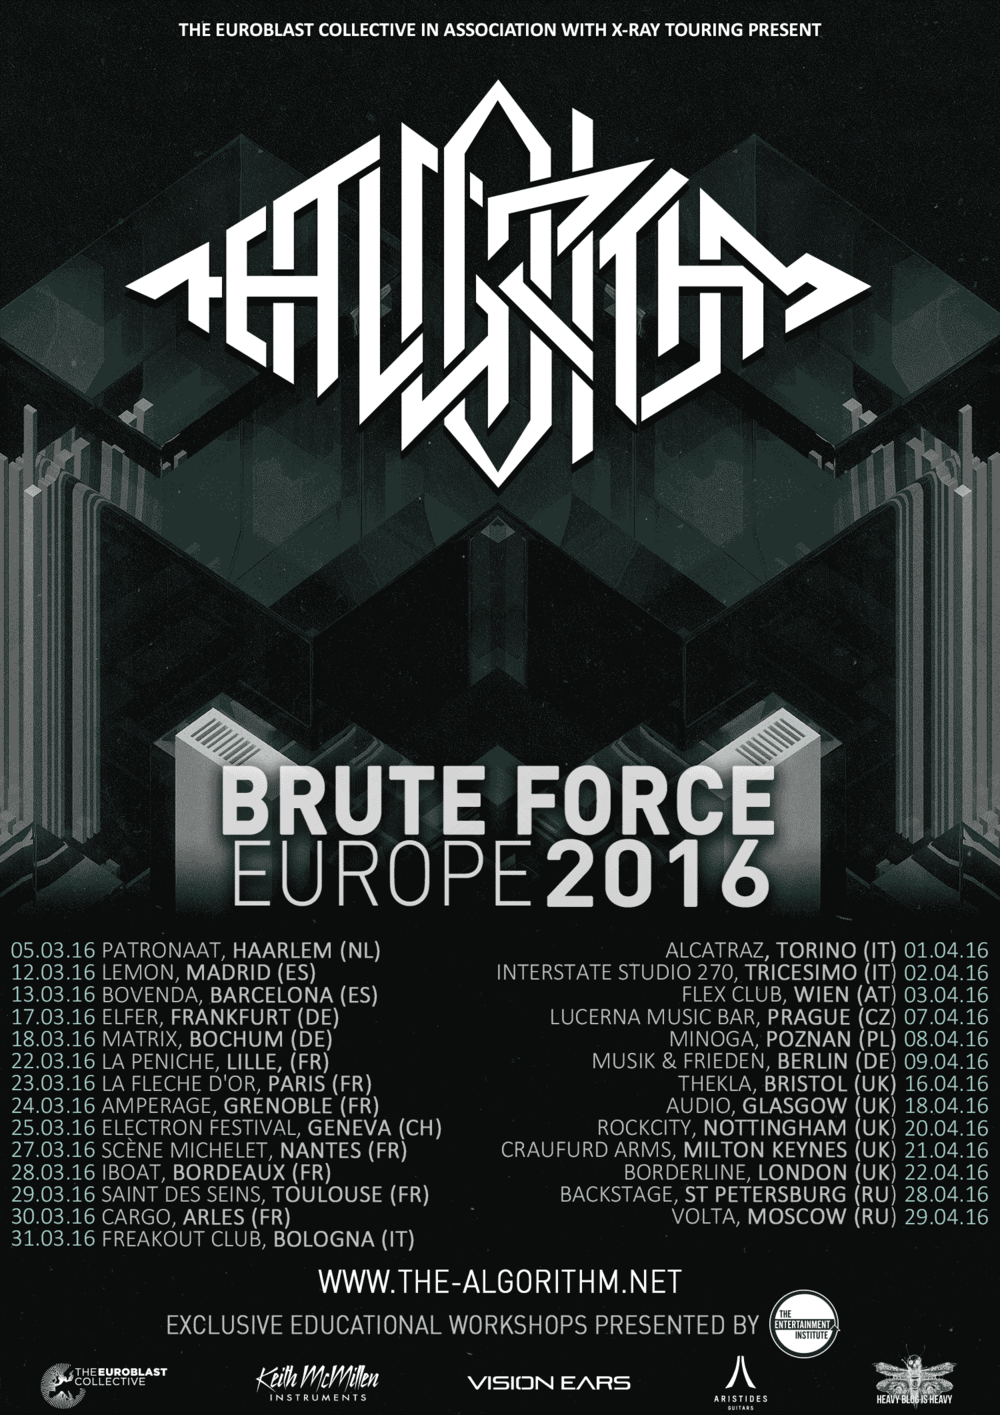 brute-force-europe2016